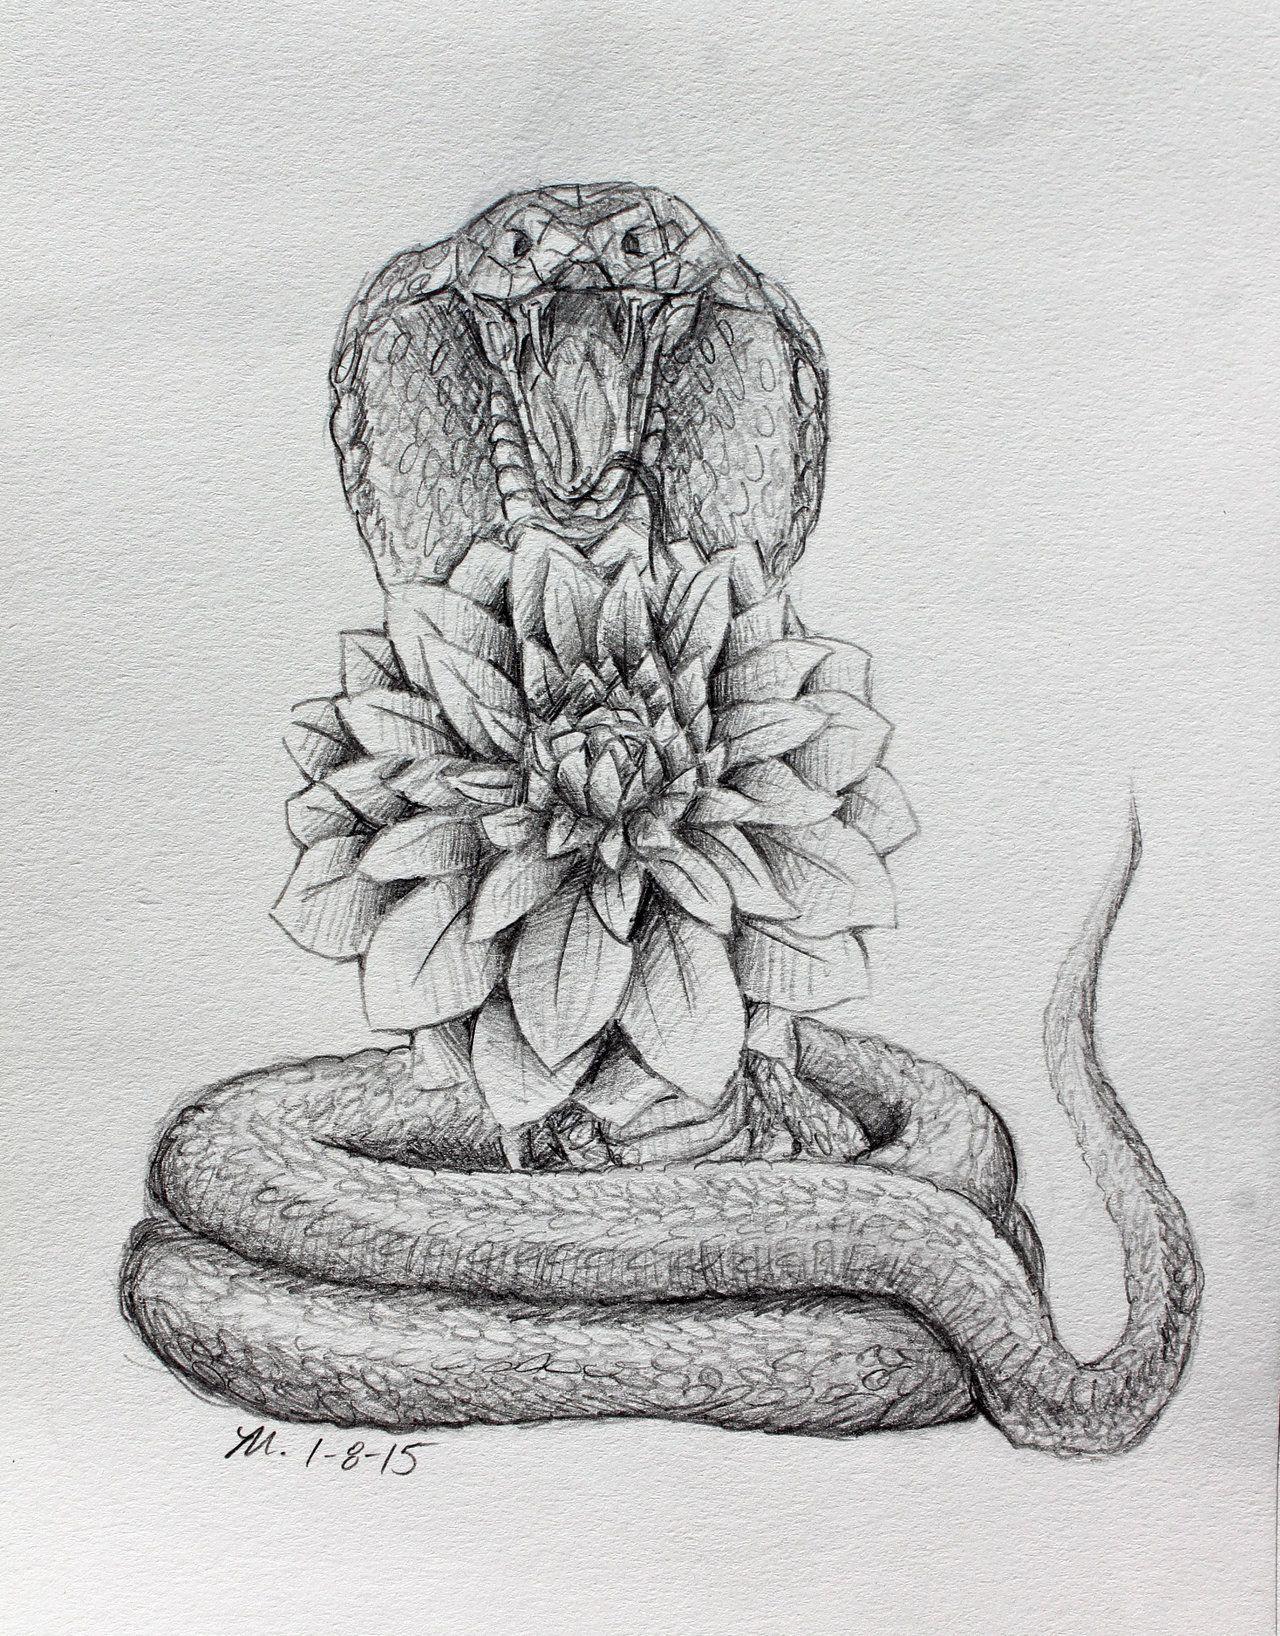 Photo Realistic Flower Tattoos Google Search: Dahlia Flower Tattoo Black And White